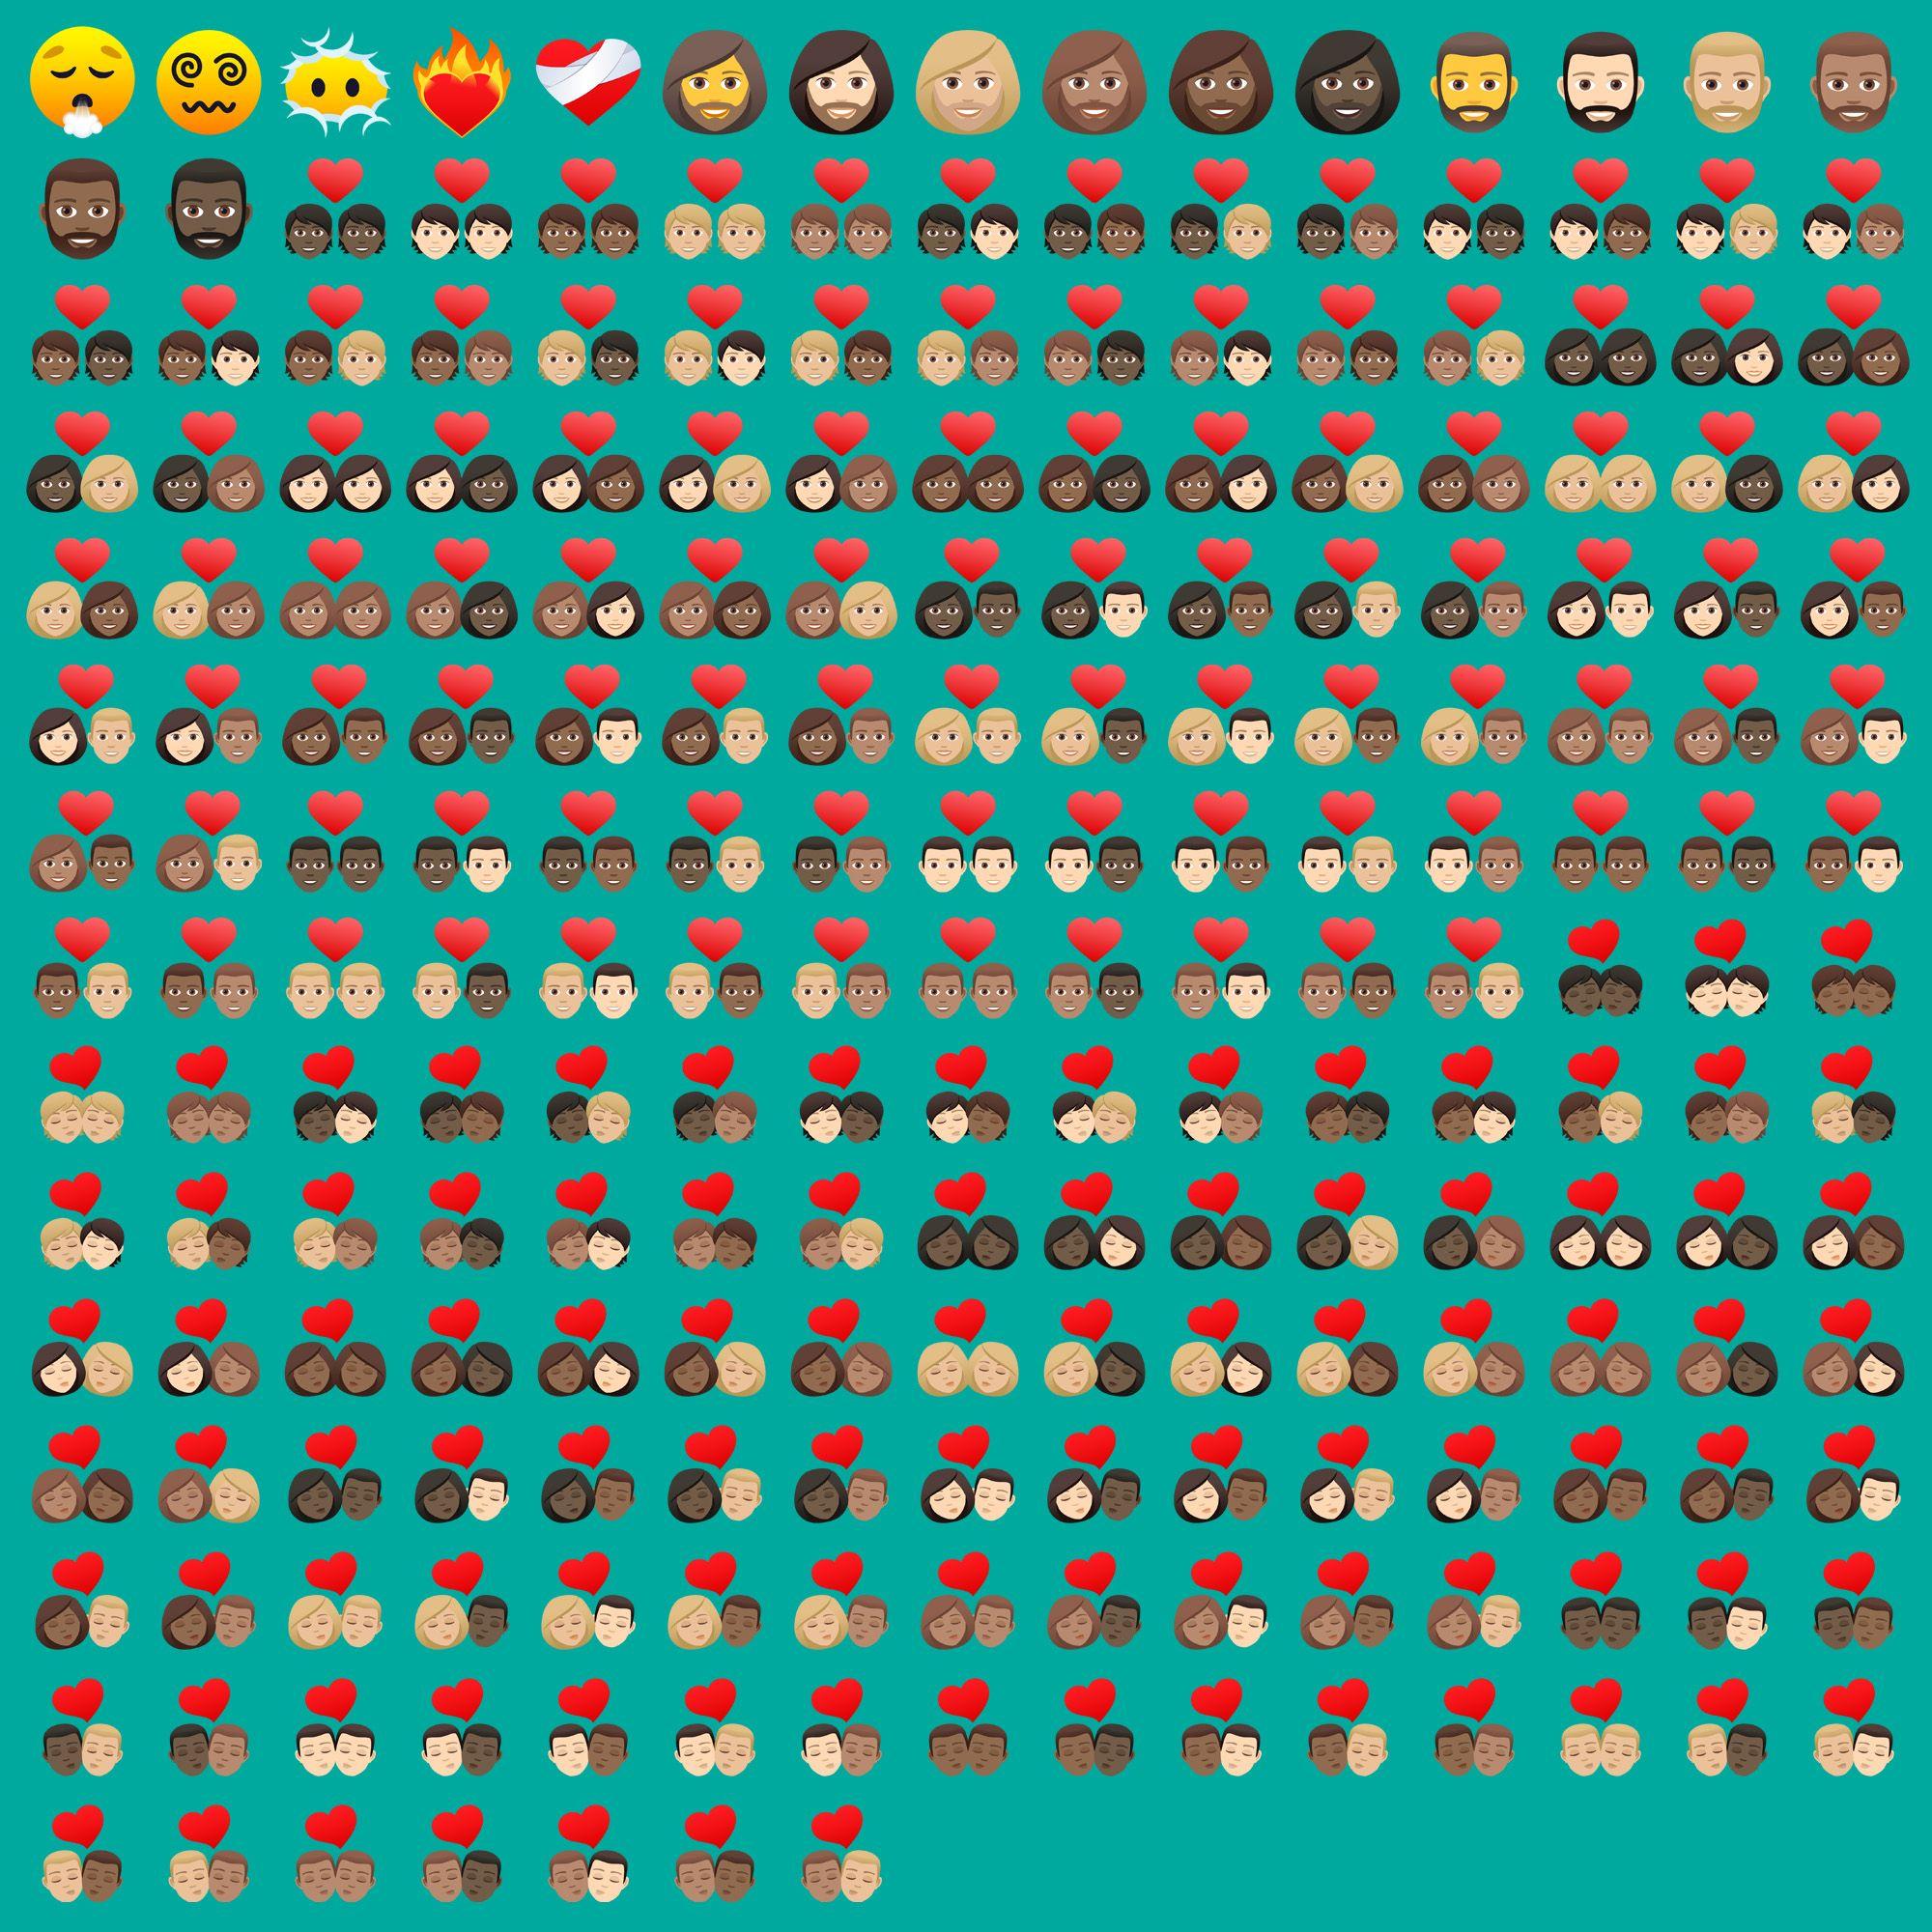 Emojipedia-JoyPixels-6_5-All-New-Emoji-Images